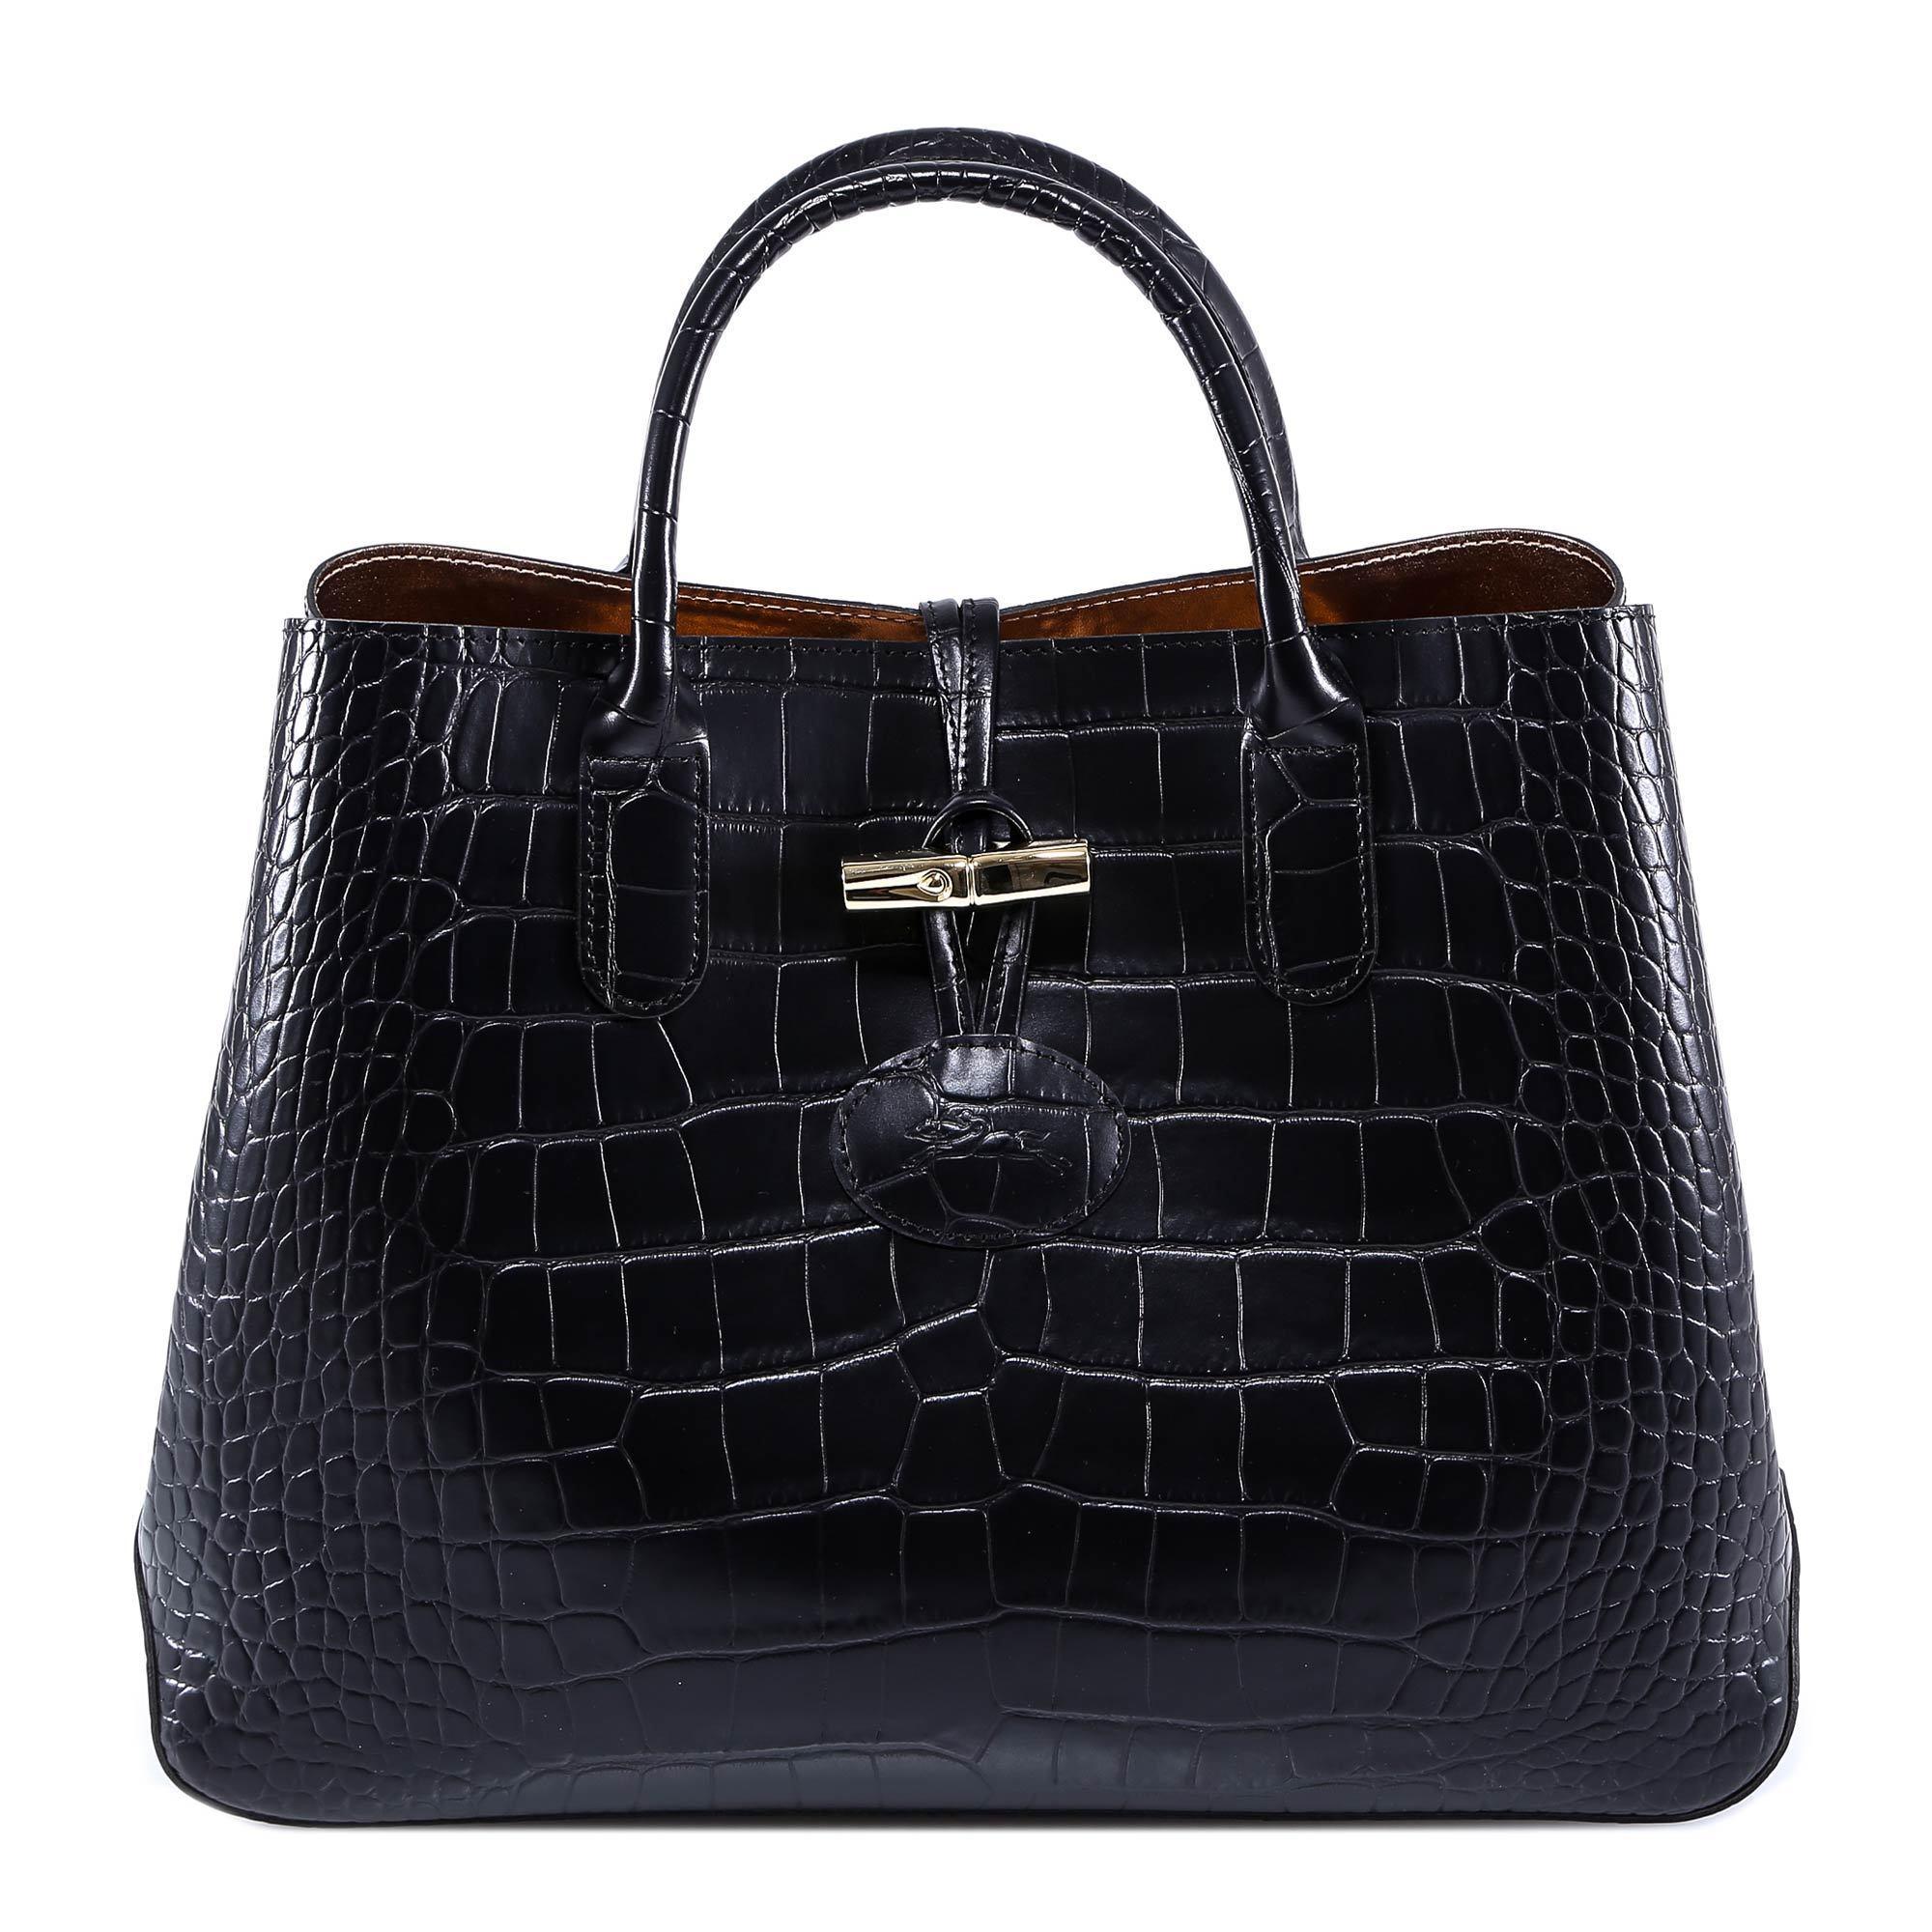 Longchamp Roseau Crocodile S Tote Bag In Black